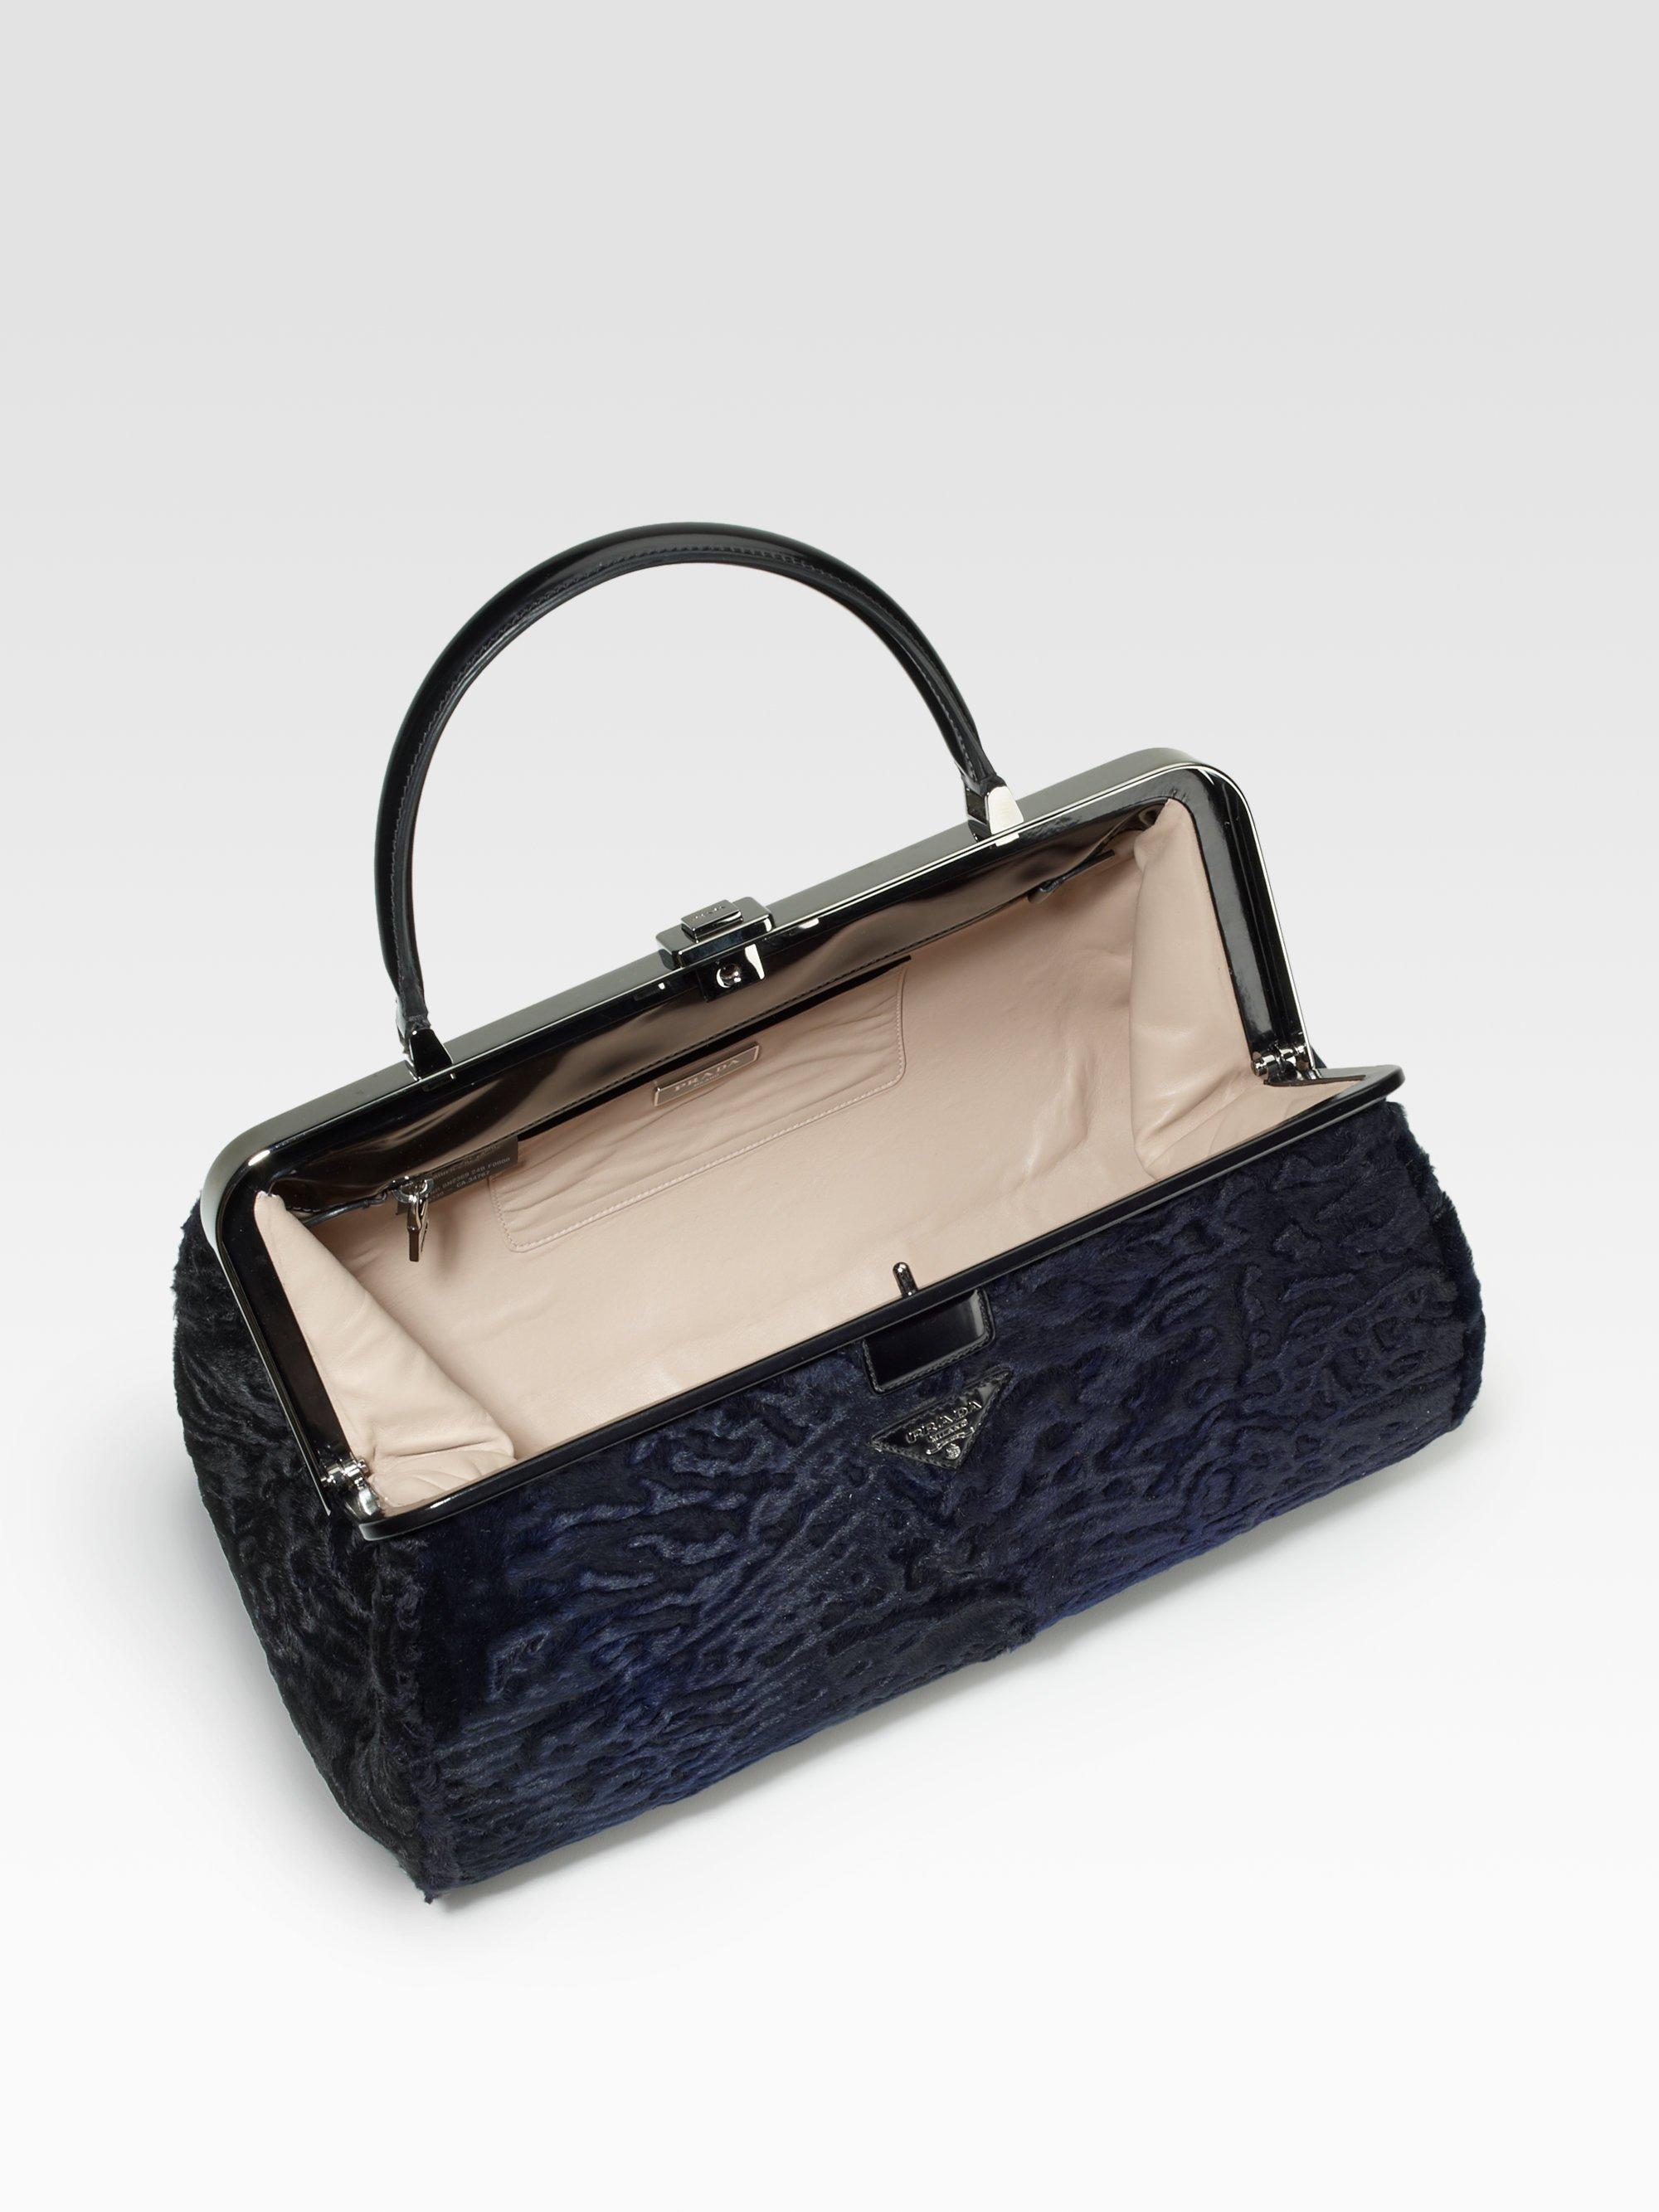 prada wallets for sale - prada frame bag black